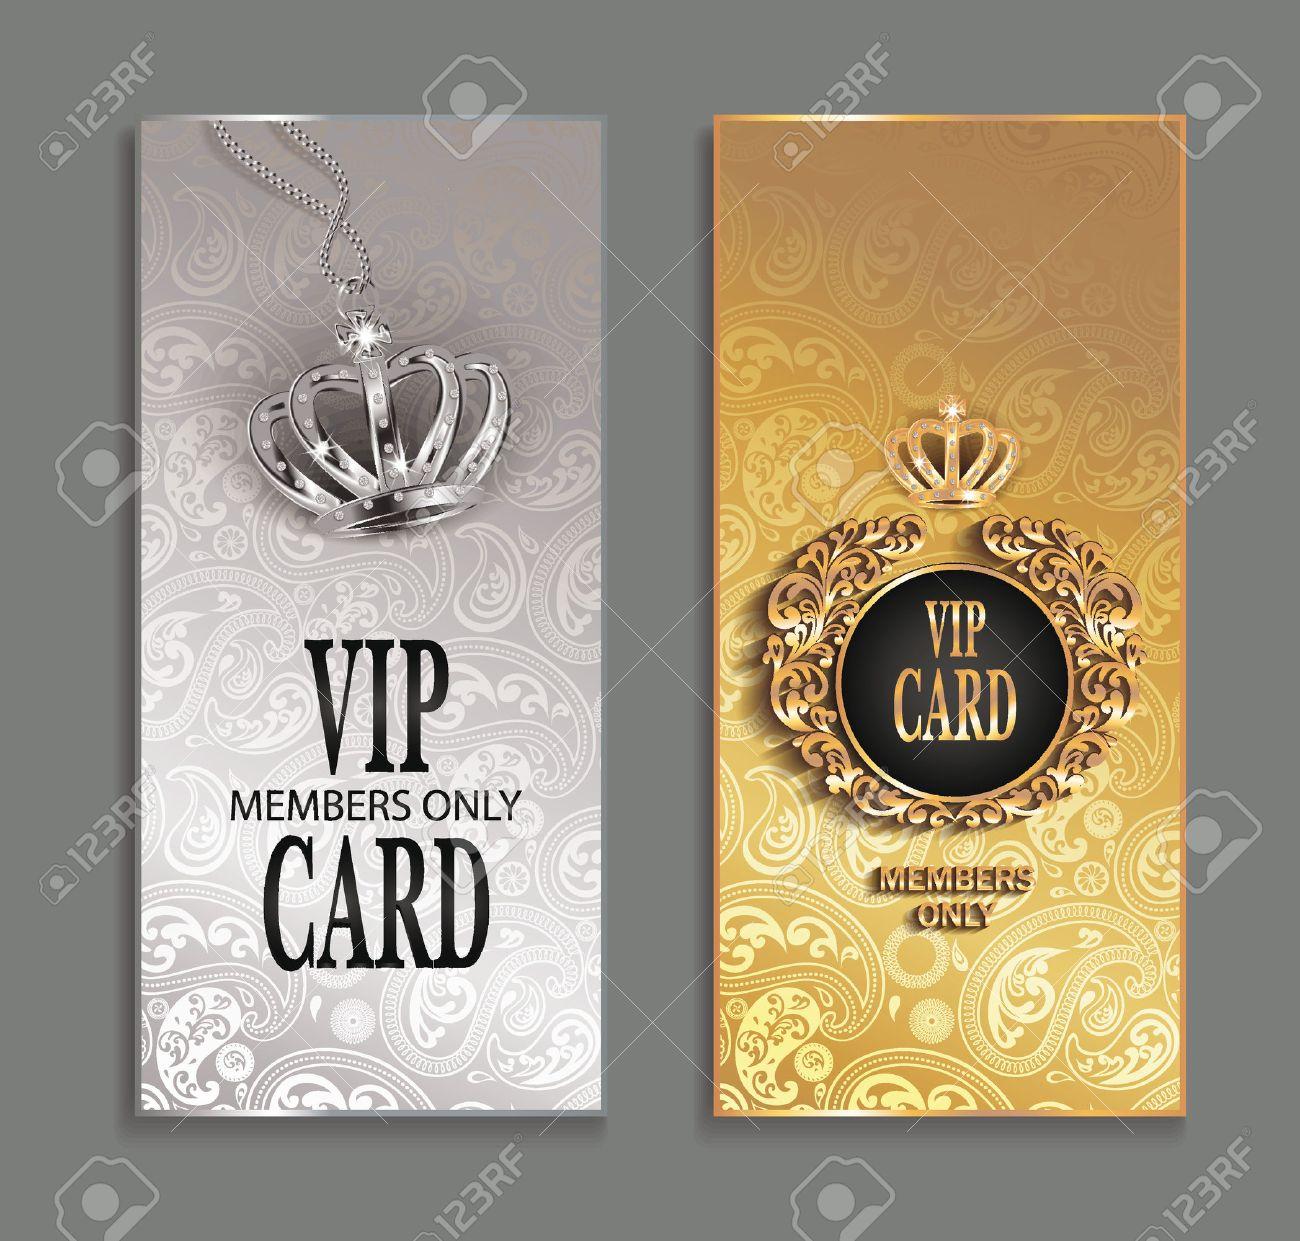 Elegant invitation vip cards with floral design royalty free elegant invitation vip cards with floral design stock vector 39293666 stopboris Gallery